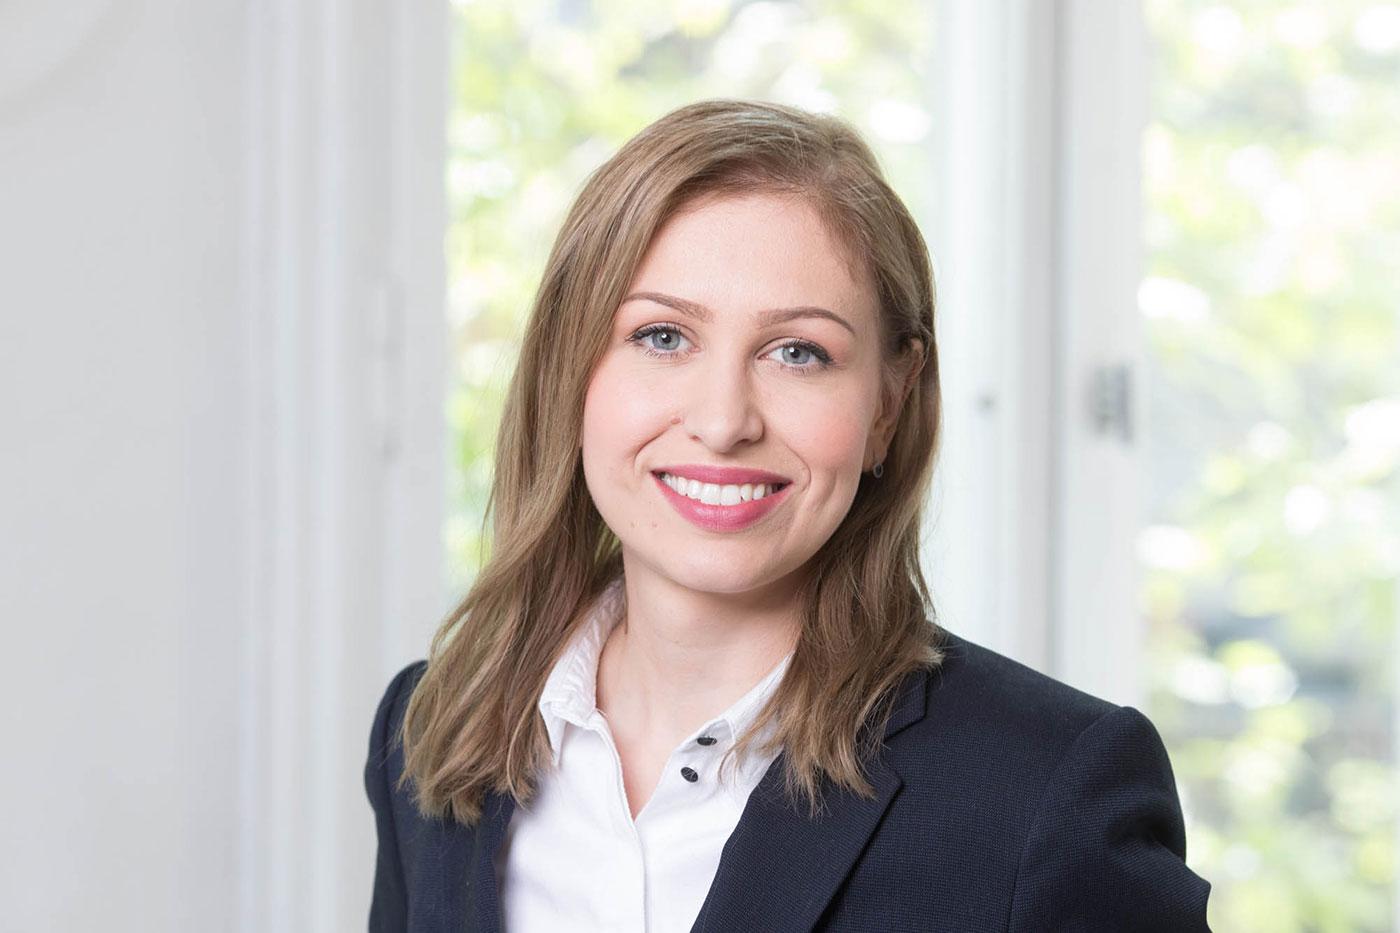 Rechtsanwältin Elisabeta Schidowezki